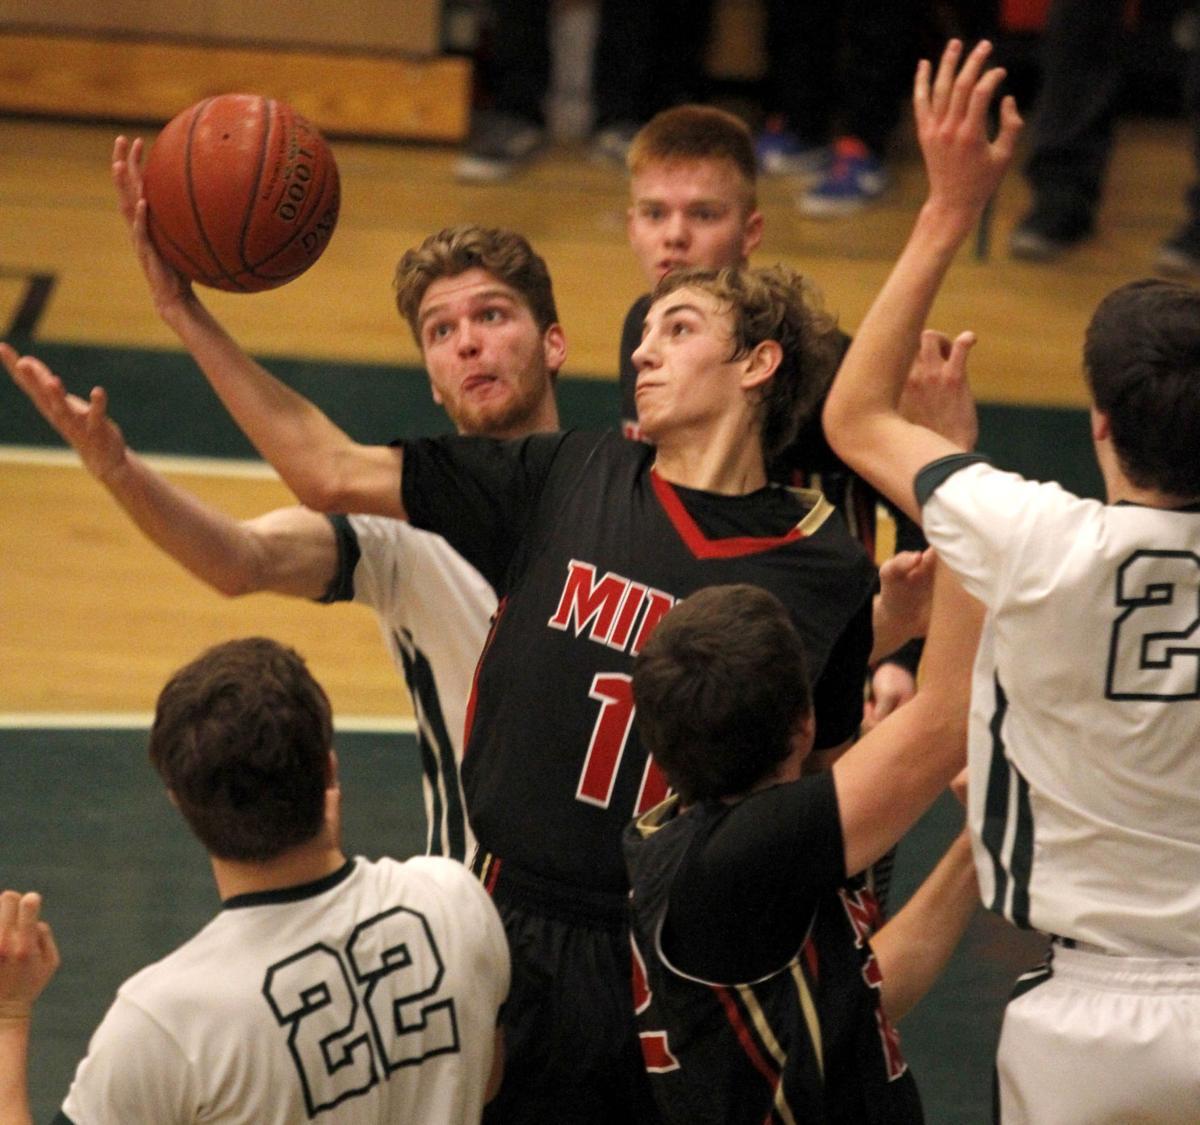 Boys Basketball - Minico Vs. Burley